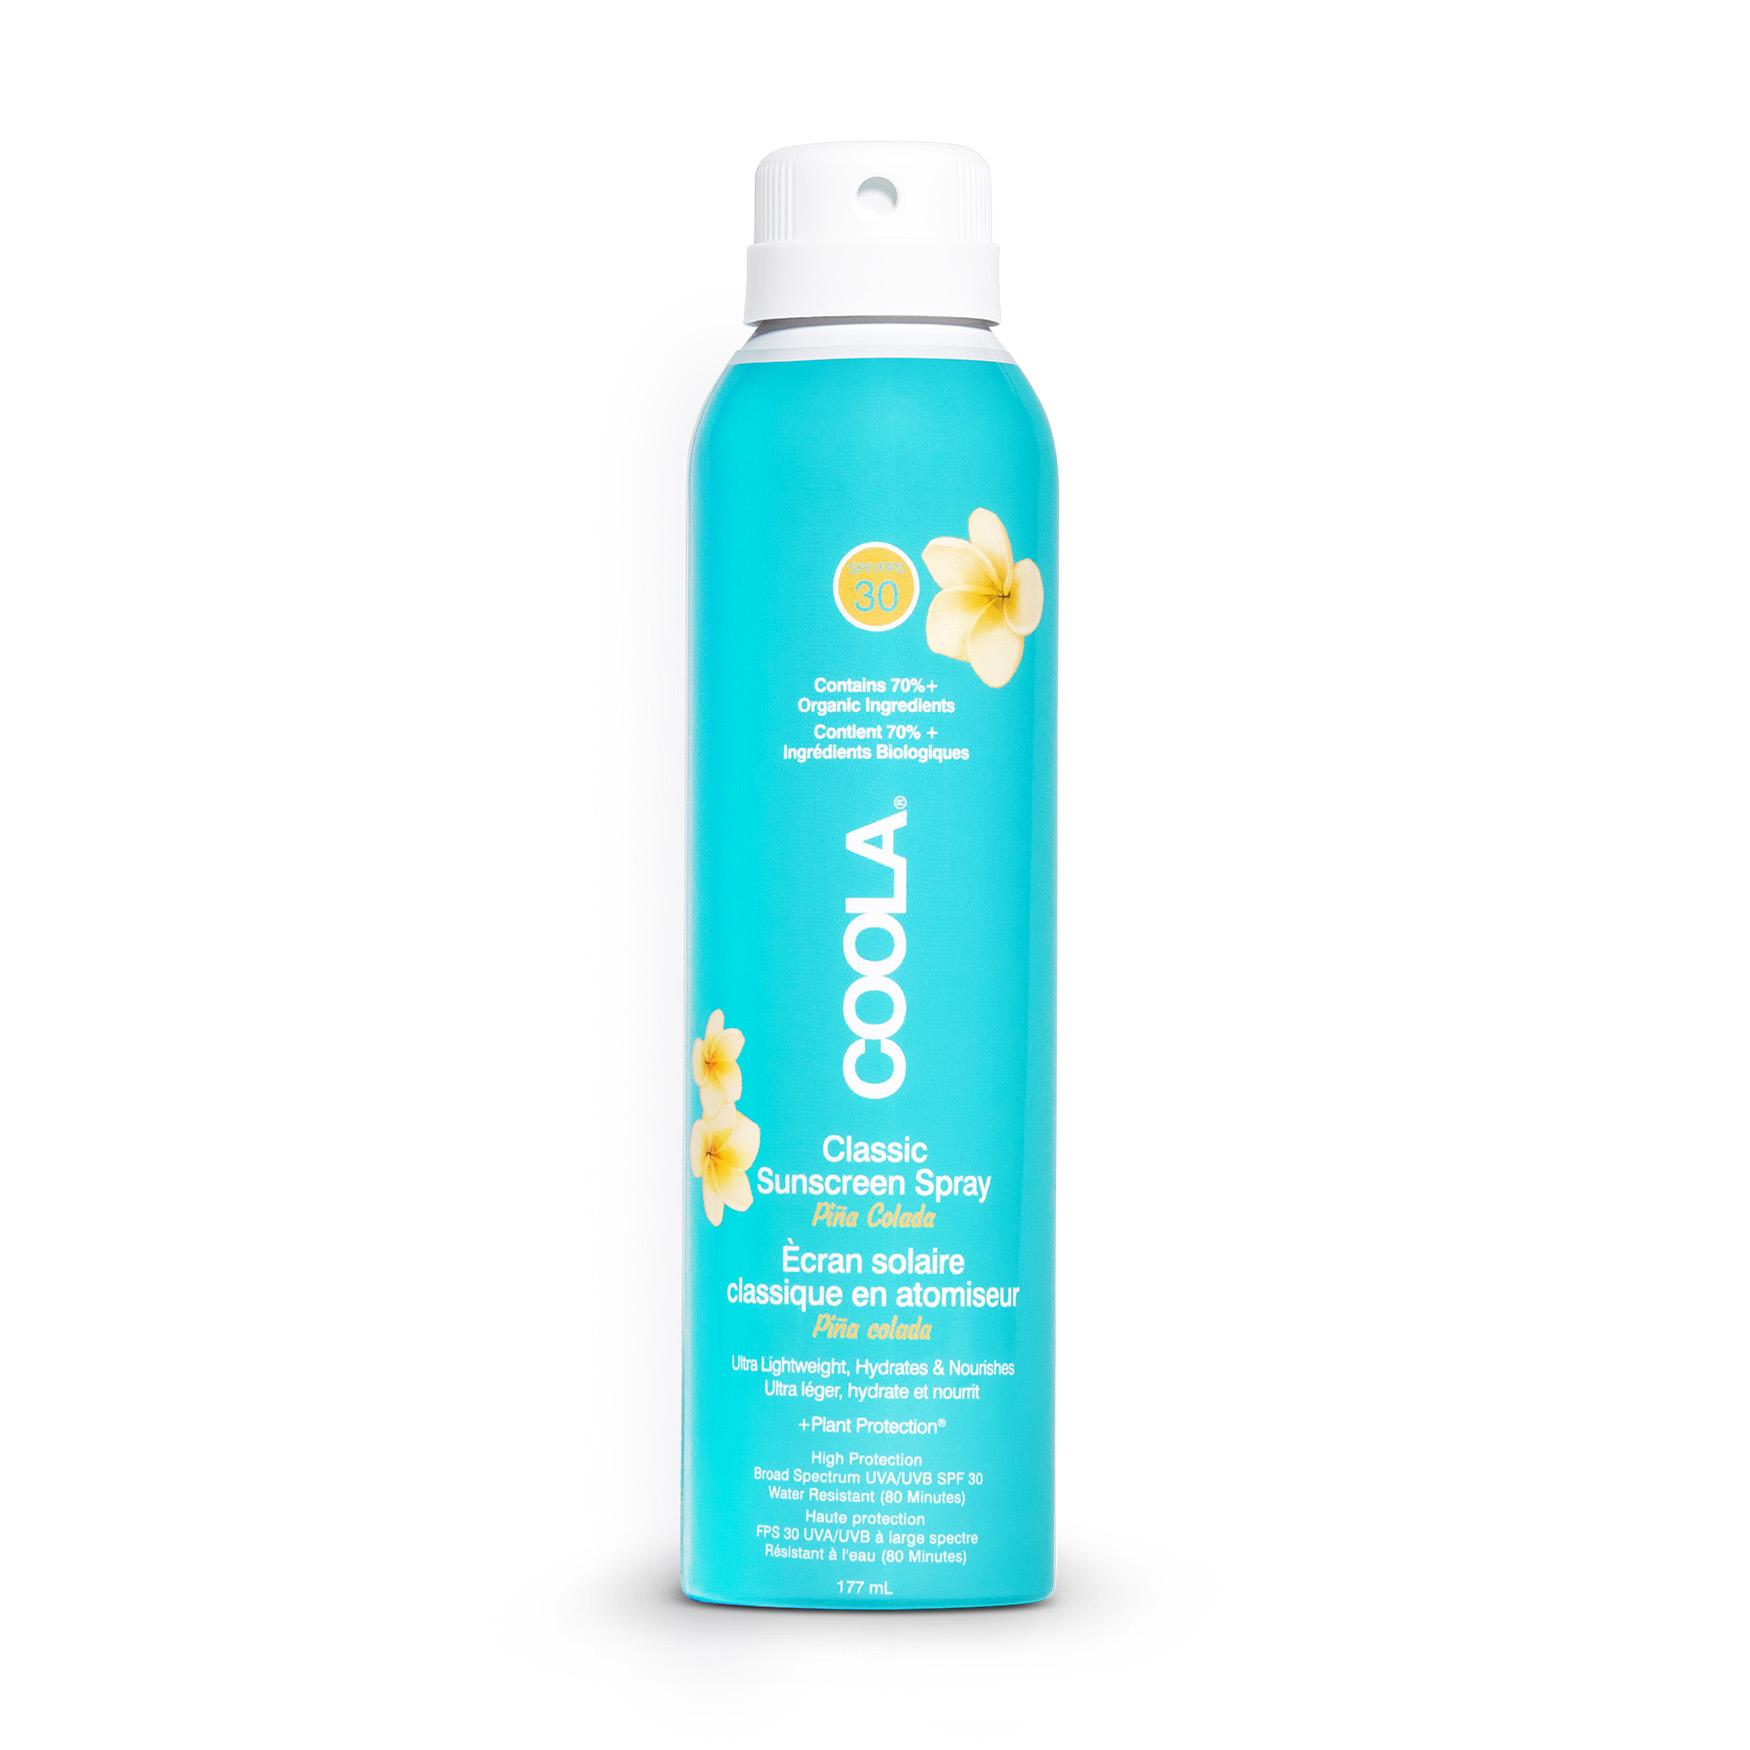 Pina Colada SPF30  Sunscreen Spray, , large